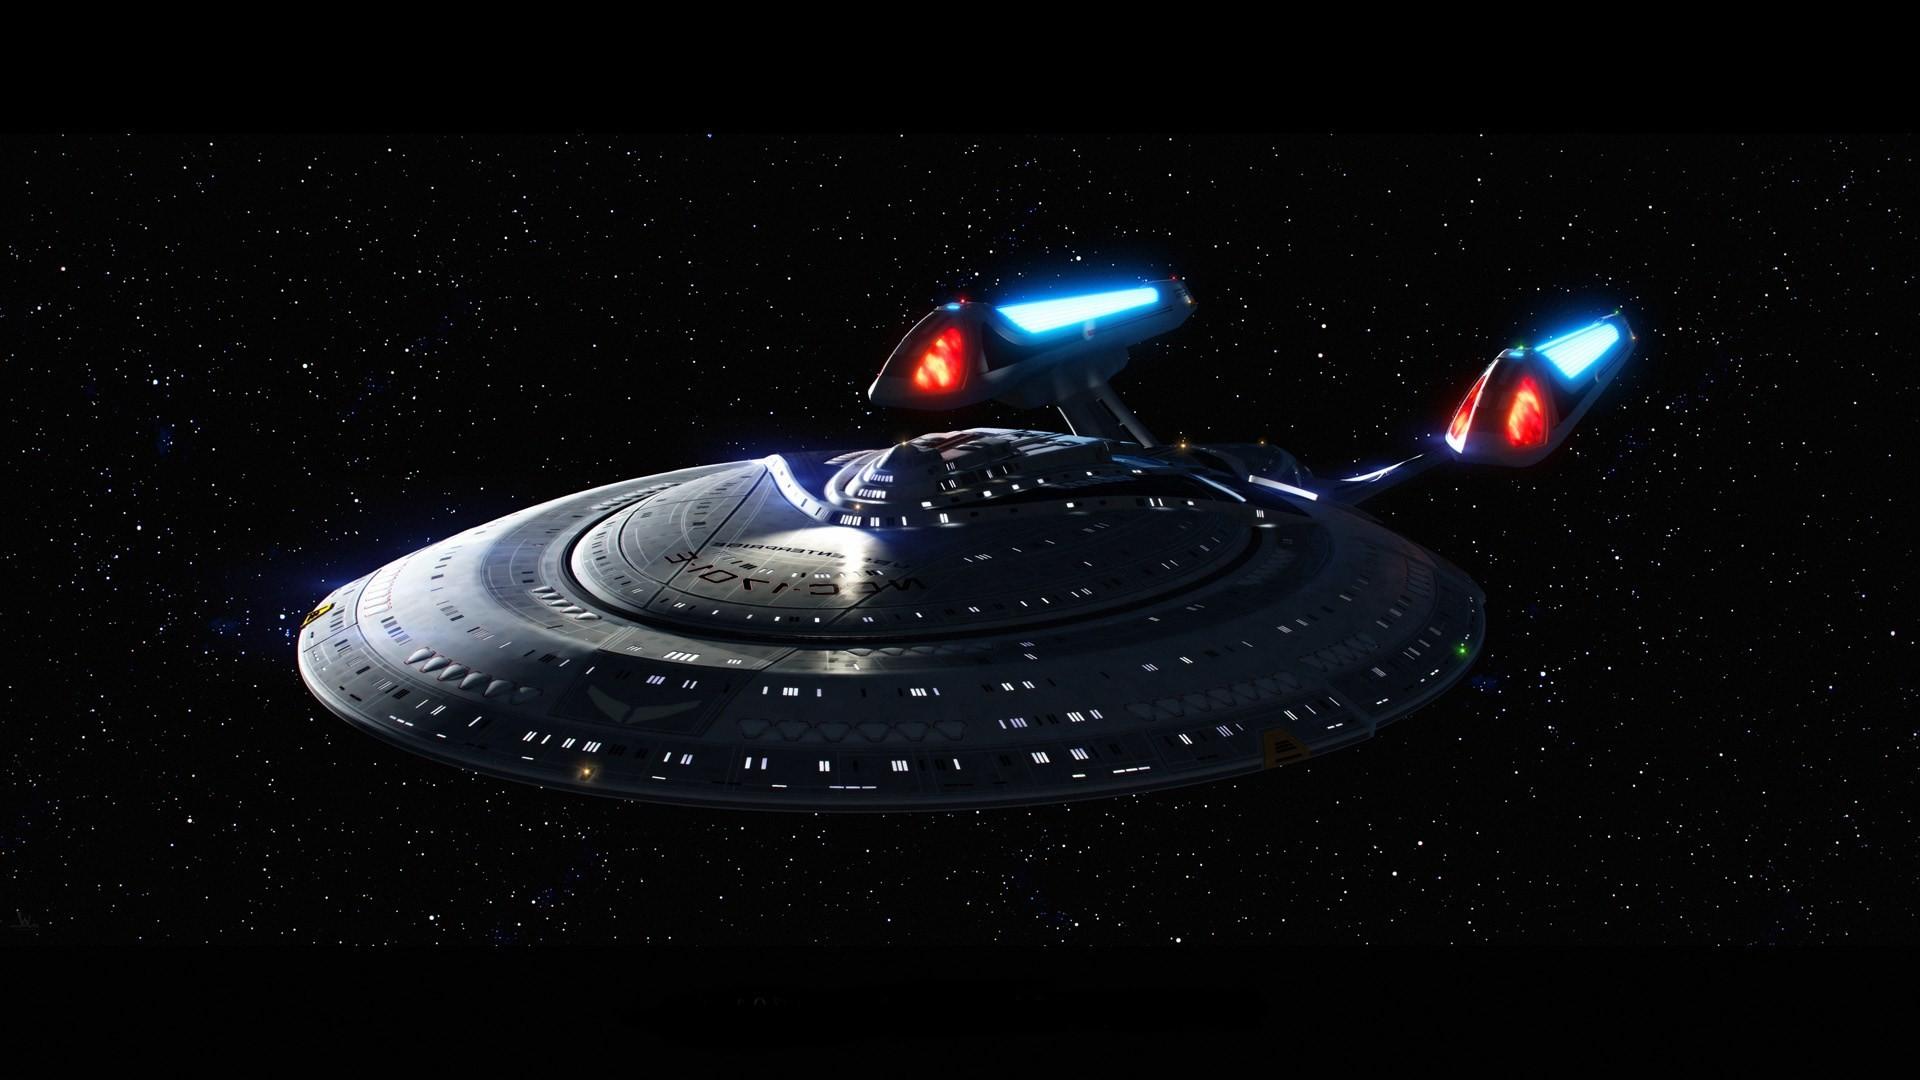 uss enterprise star trek wallpaper hd …